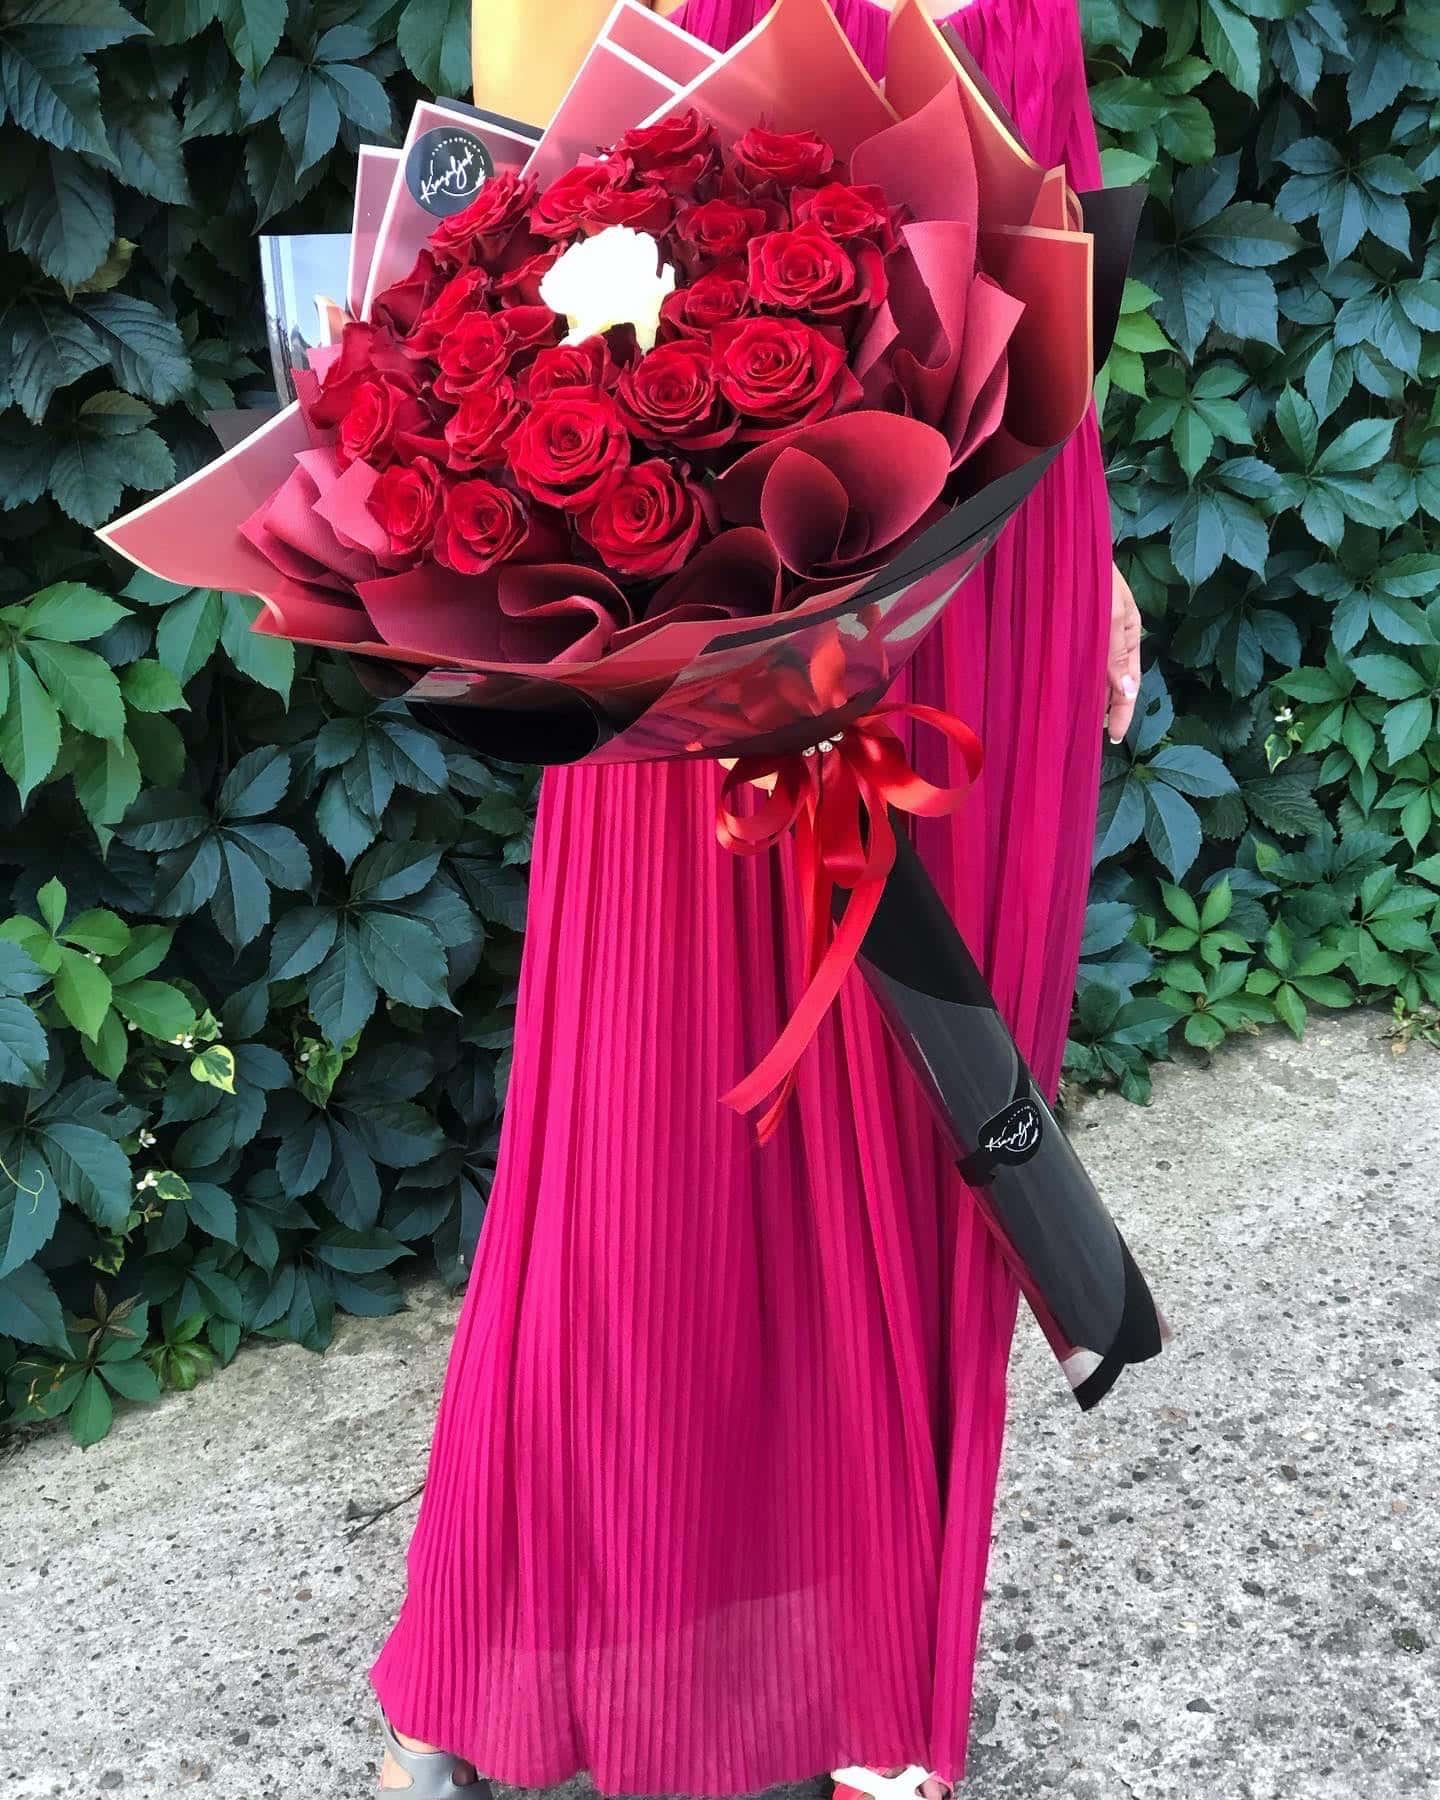 Cvece - crvene ruže u crnom papiru